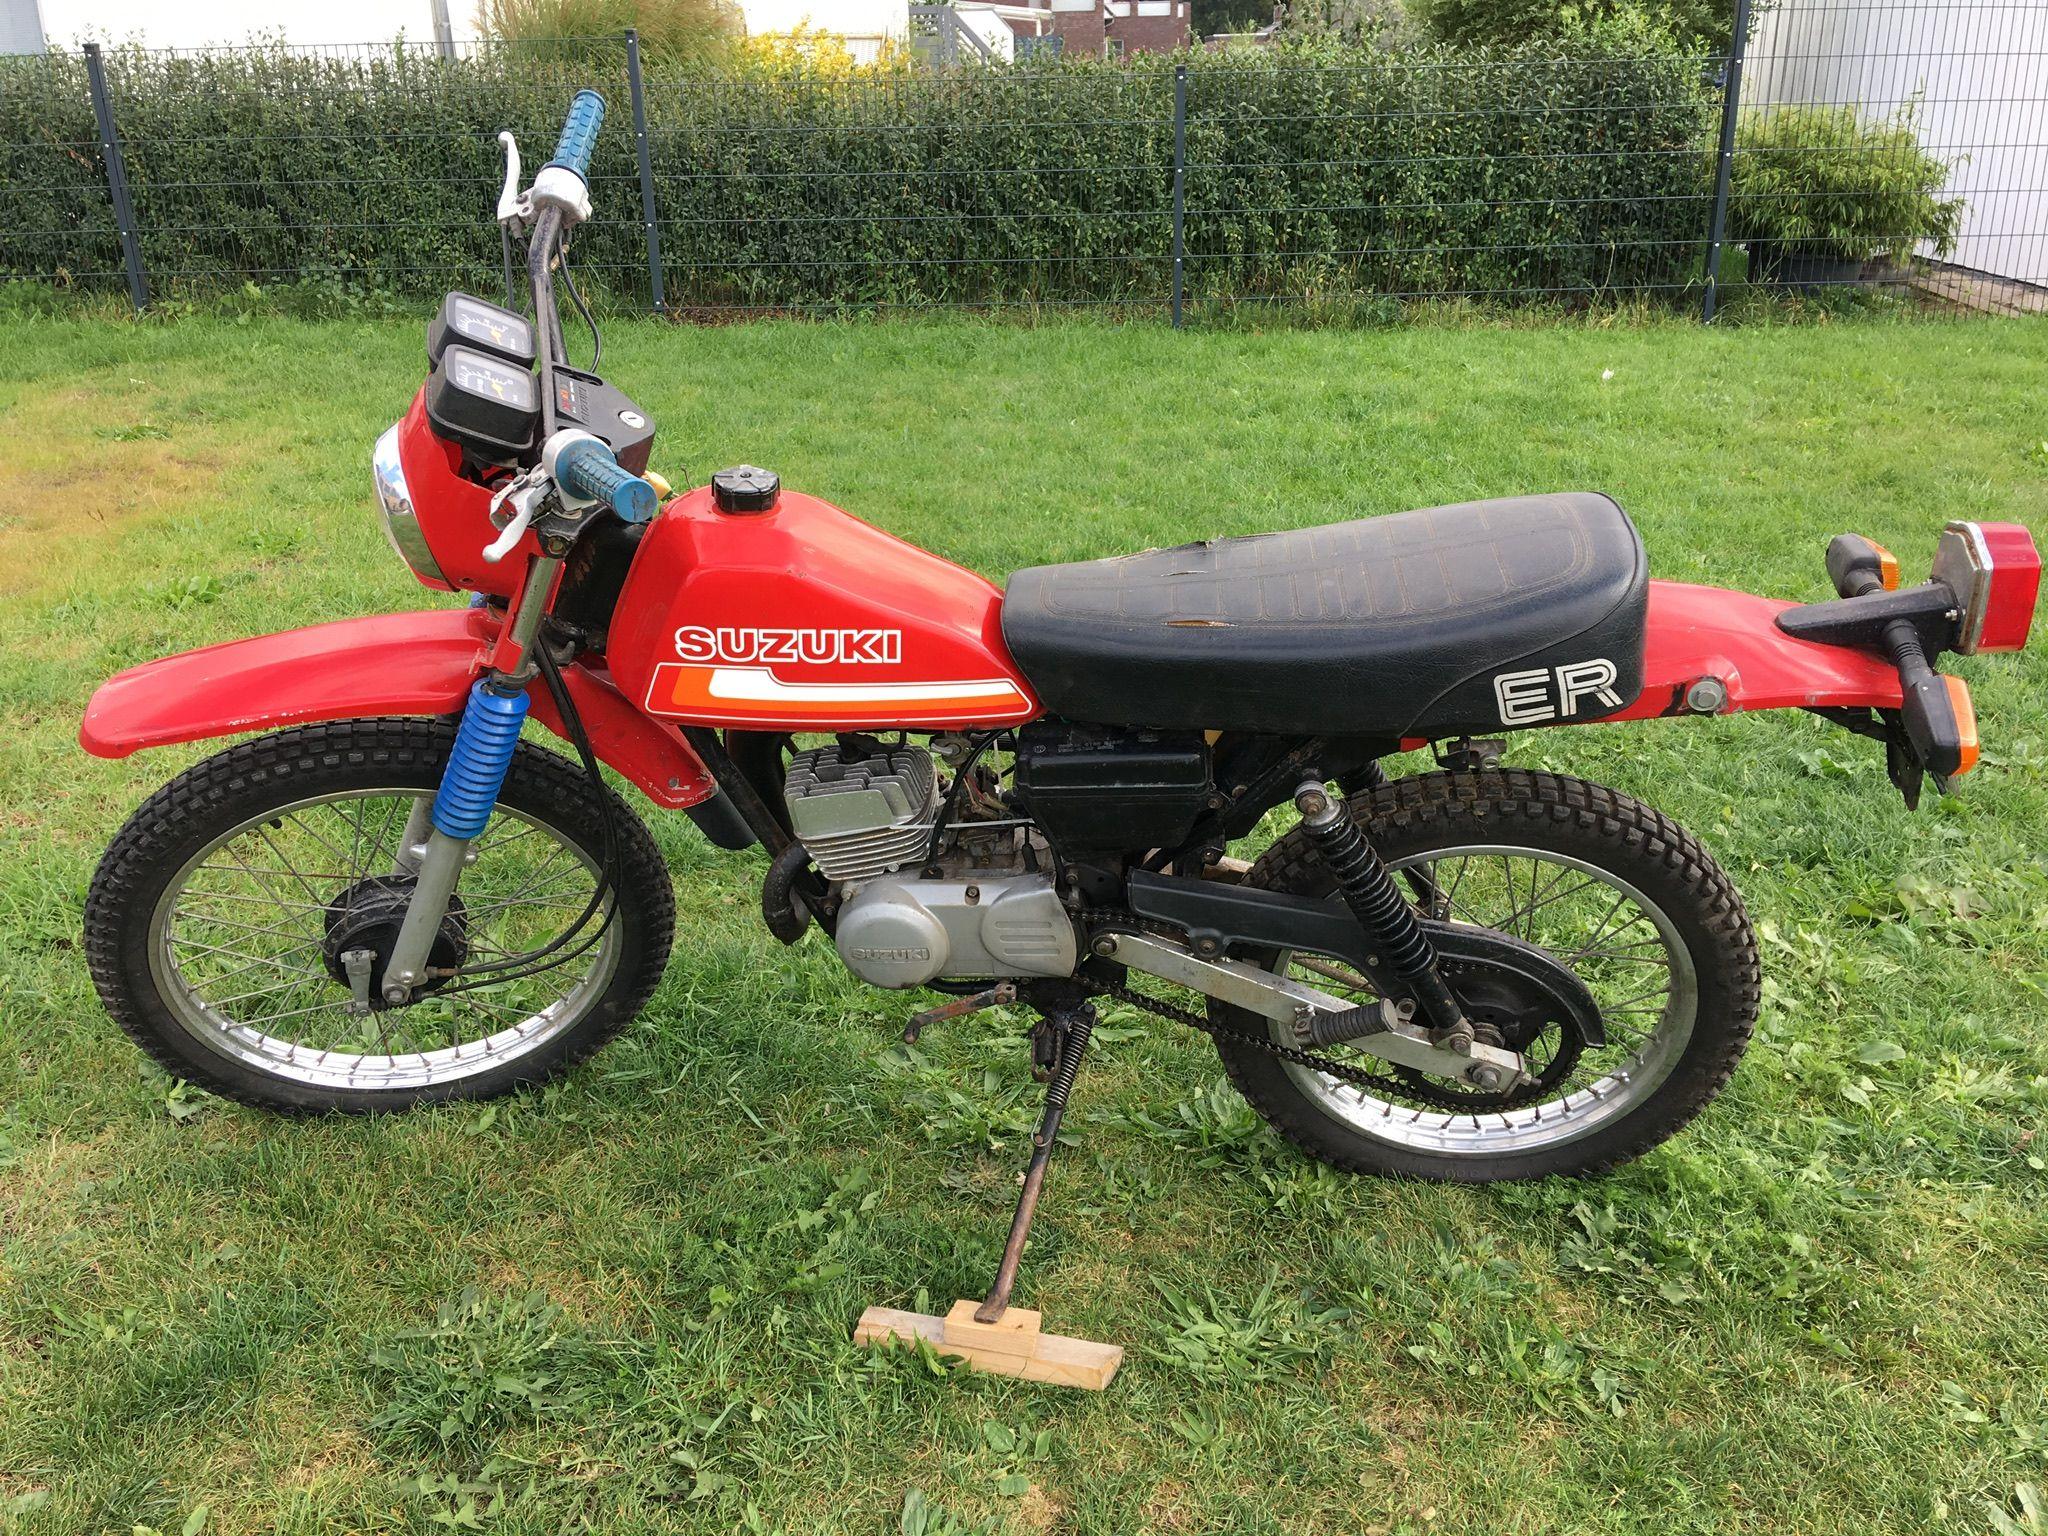 1980 suzuki ts 50 er xk red my bikes motorcycle types. Black Bedroom Furniture Sets. Home Design Ideas